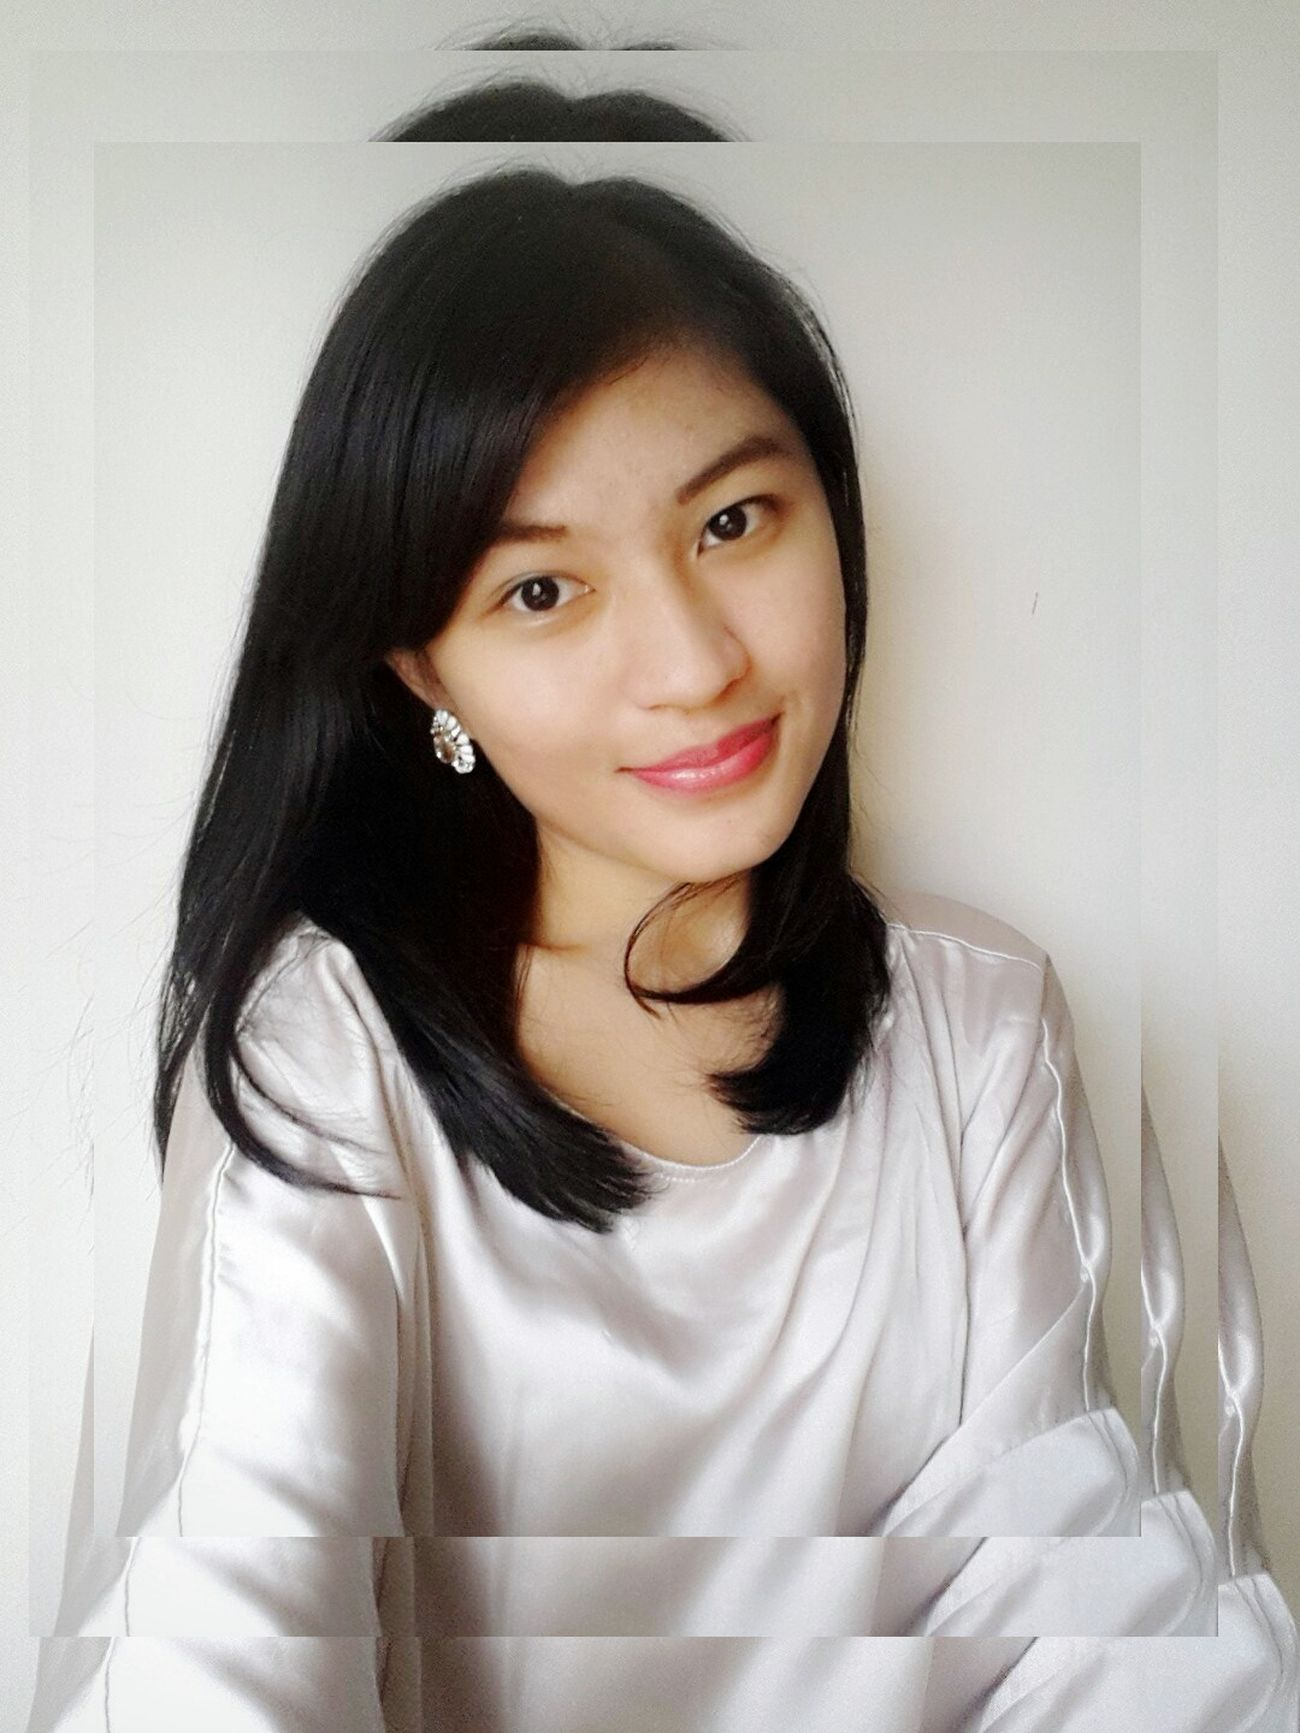 Kalem heula Hi! That's Me Smile Self Portrait Girl INDONESIA